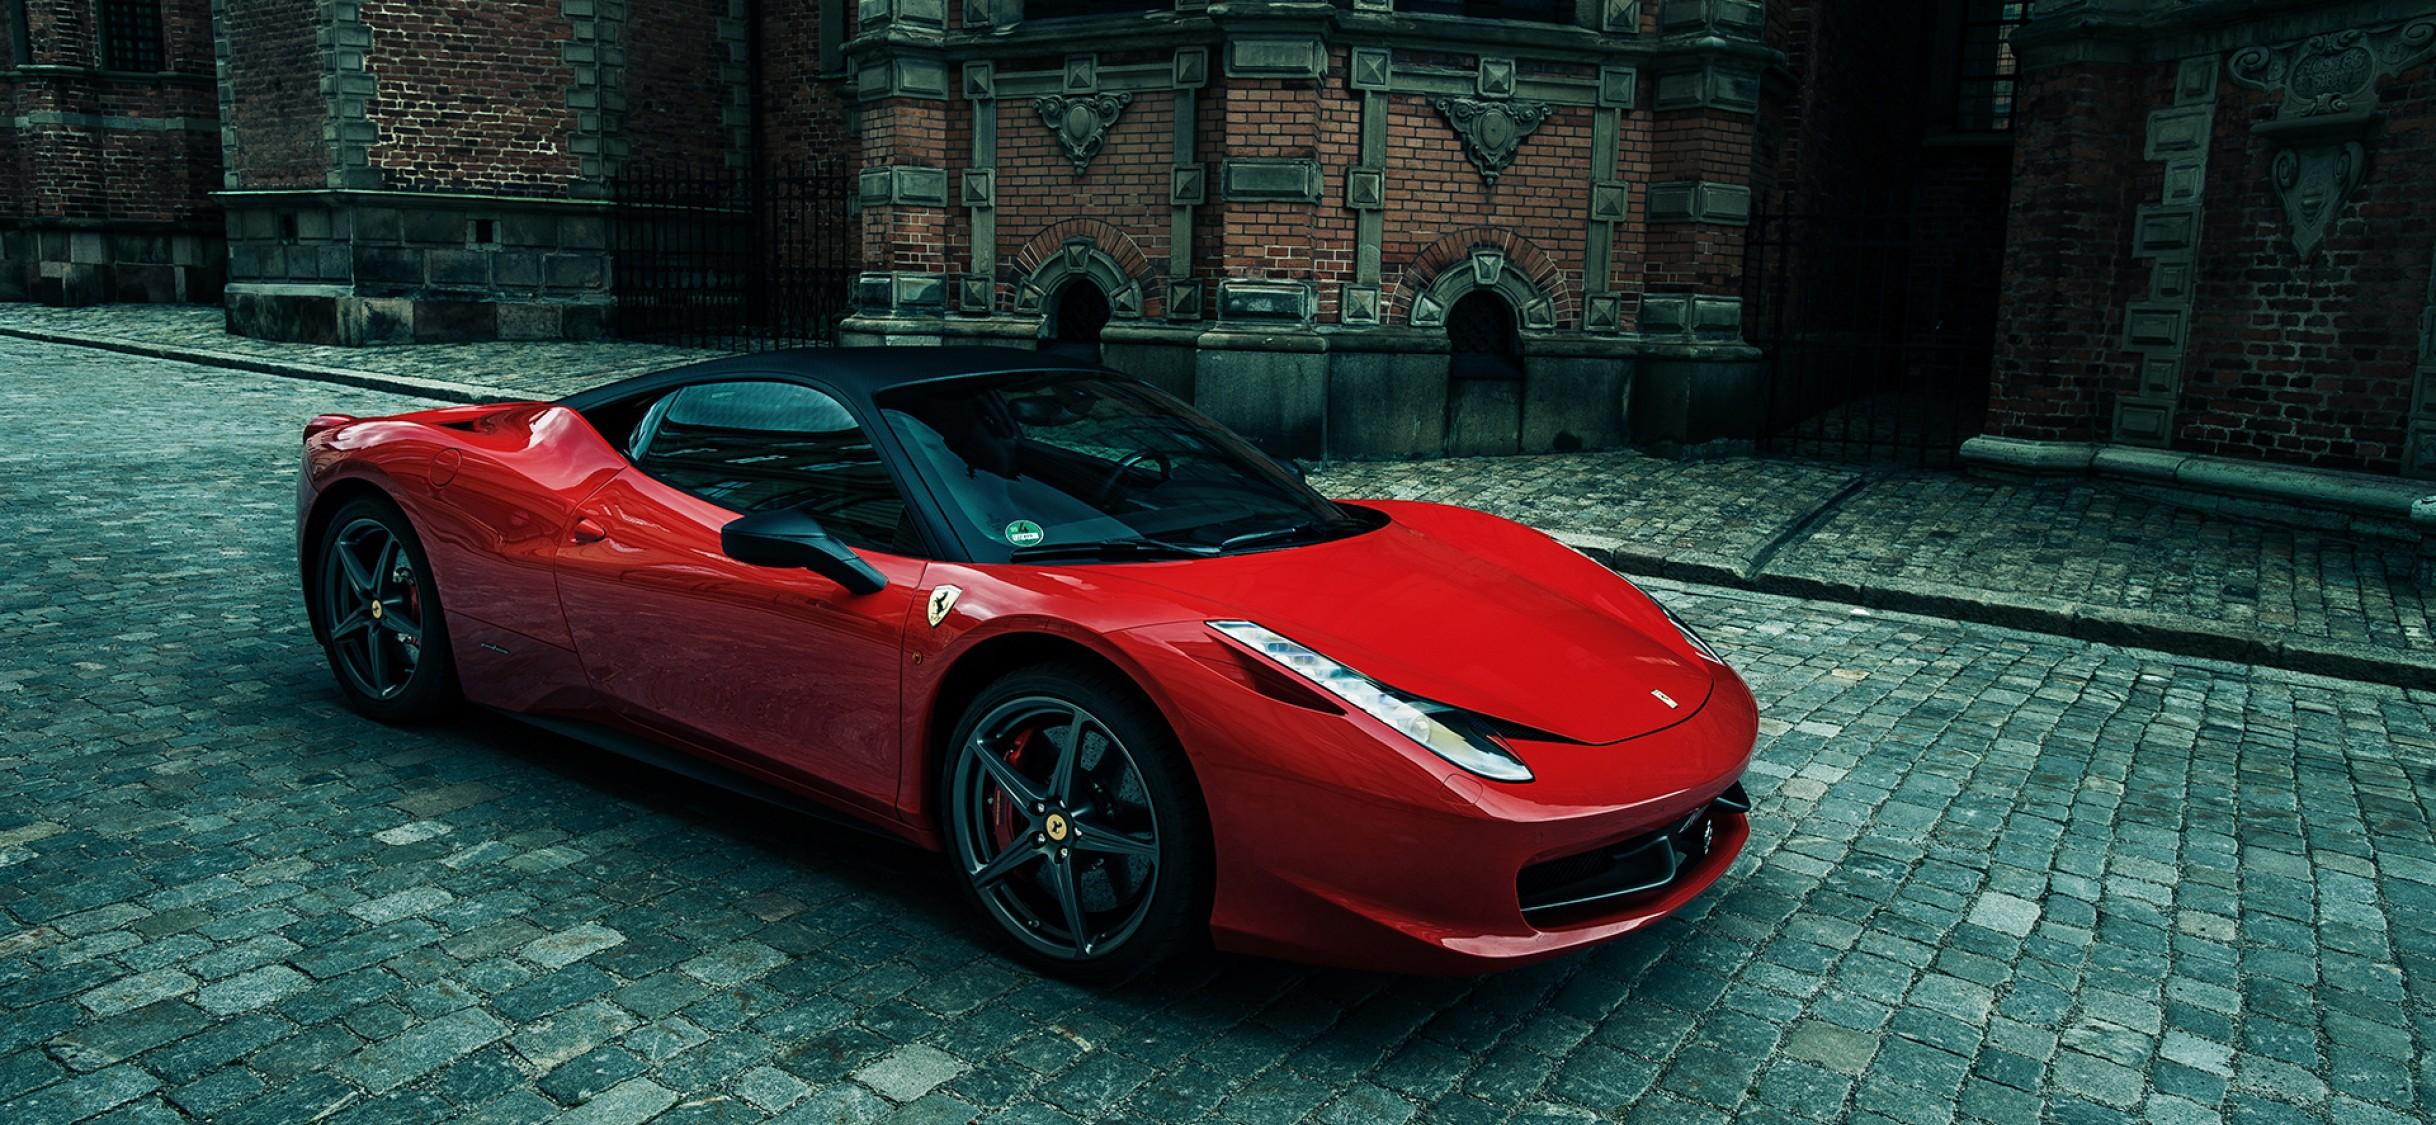 Ferrari 458 Italia Car Wallpaper For Desktop And Mobiles Iphone X Hd Wallpaper Wallpapers Net